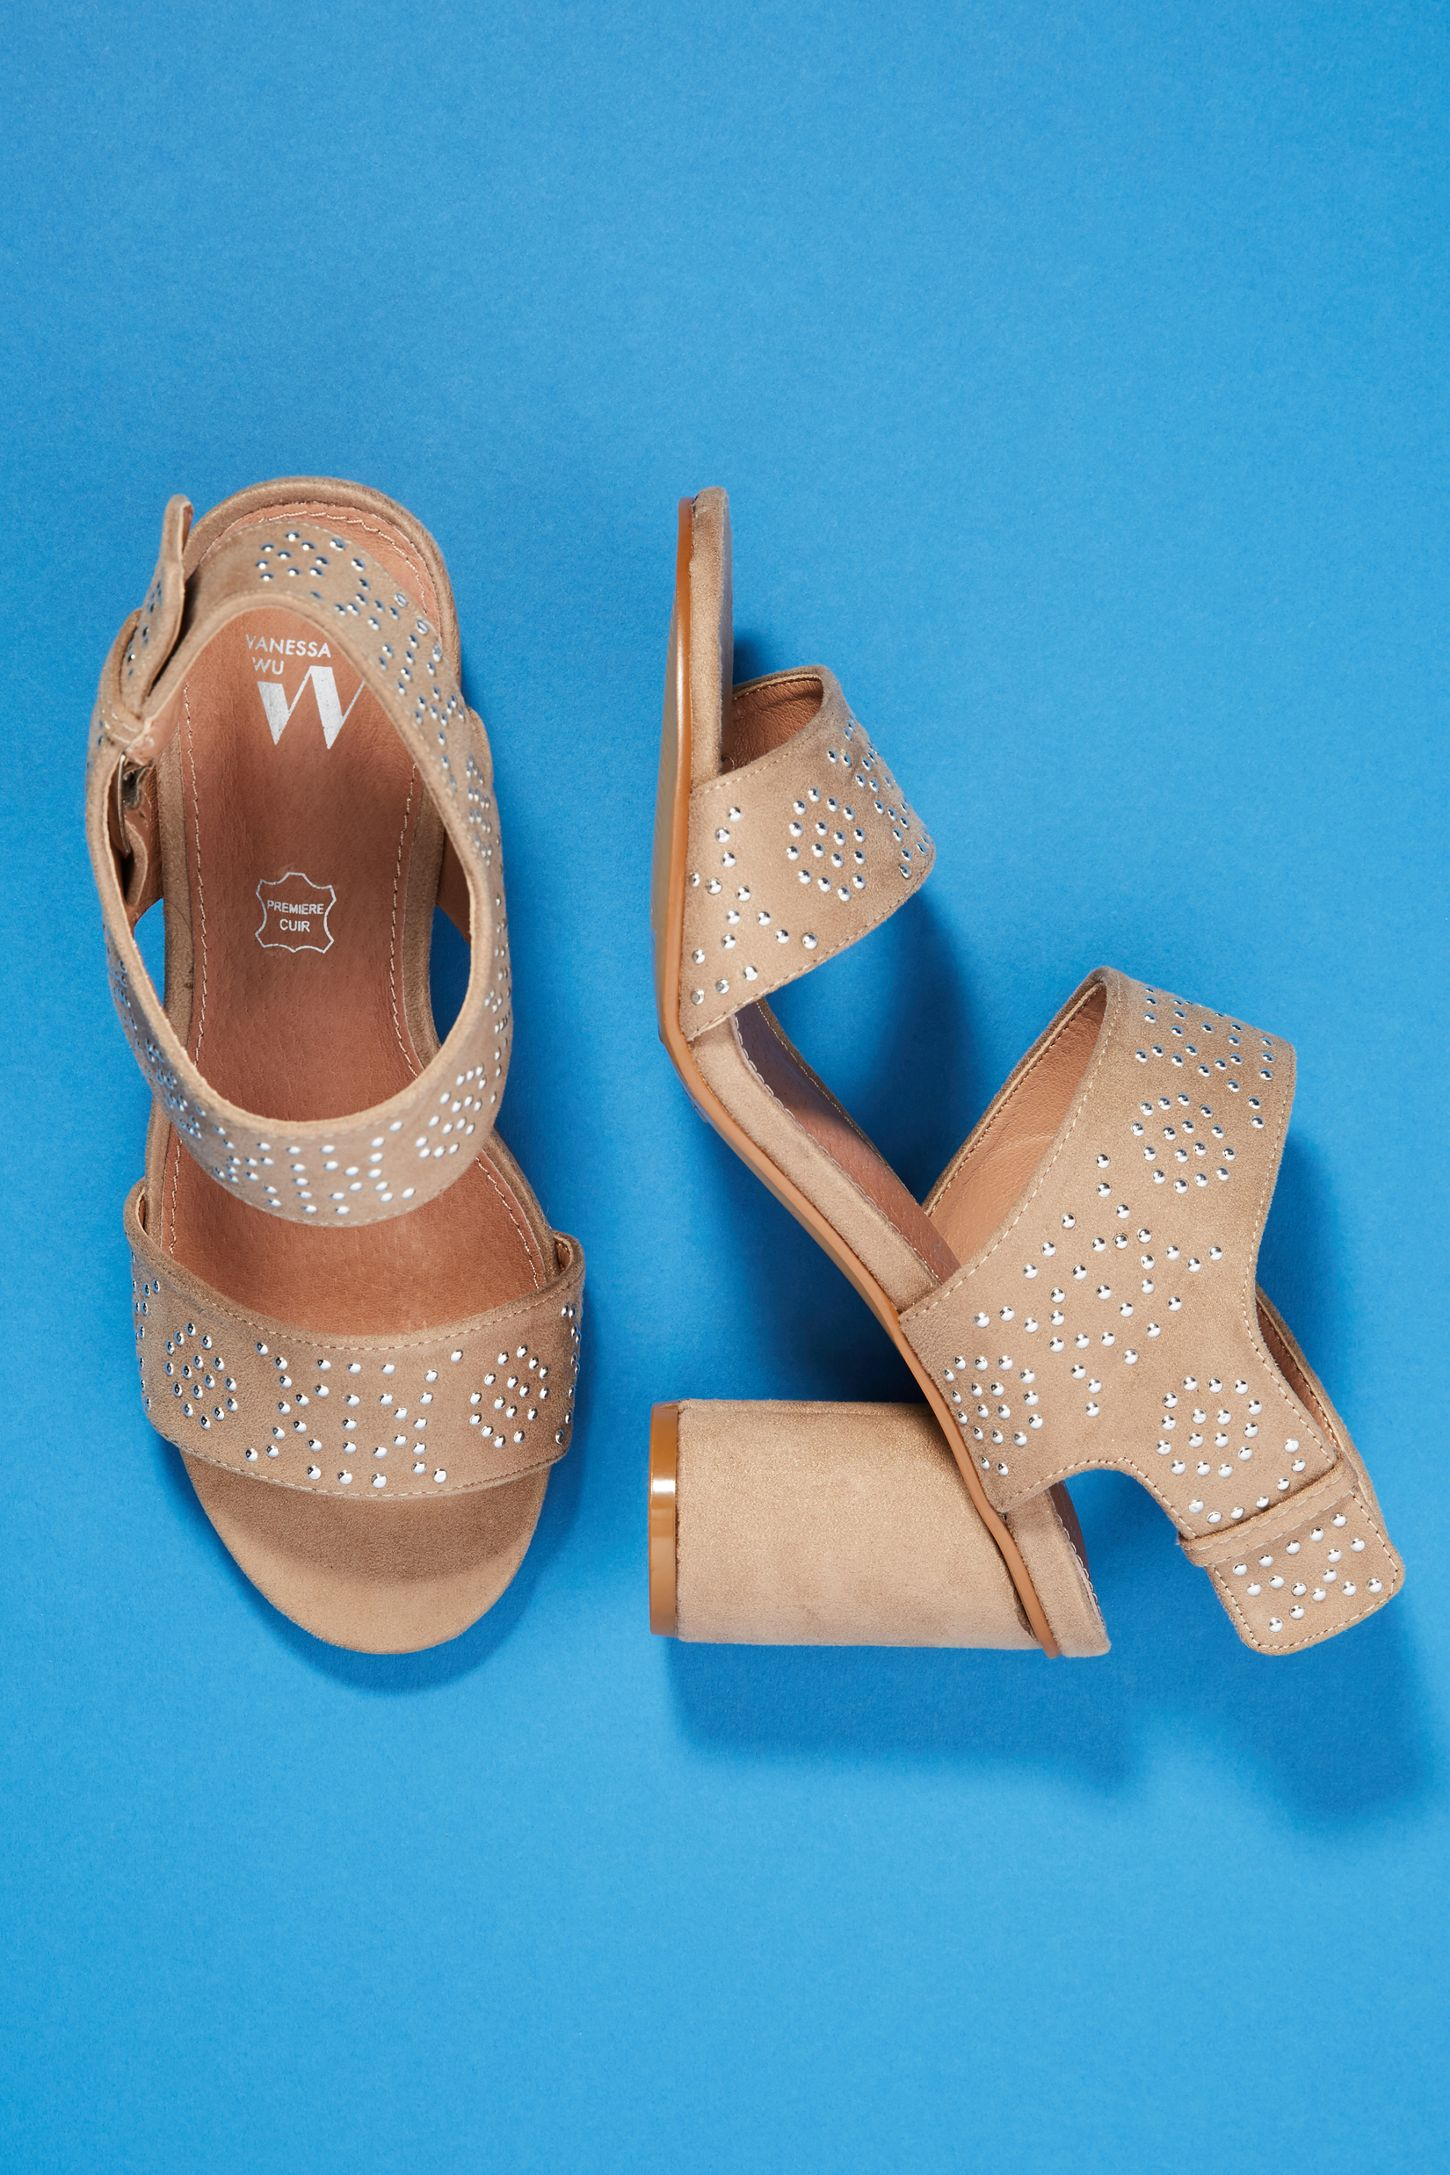 19e1a0aa88 Vanessa Wu Studded Heeled Sandals | Anthropologie